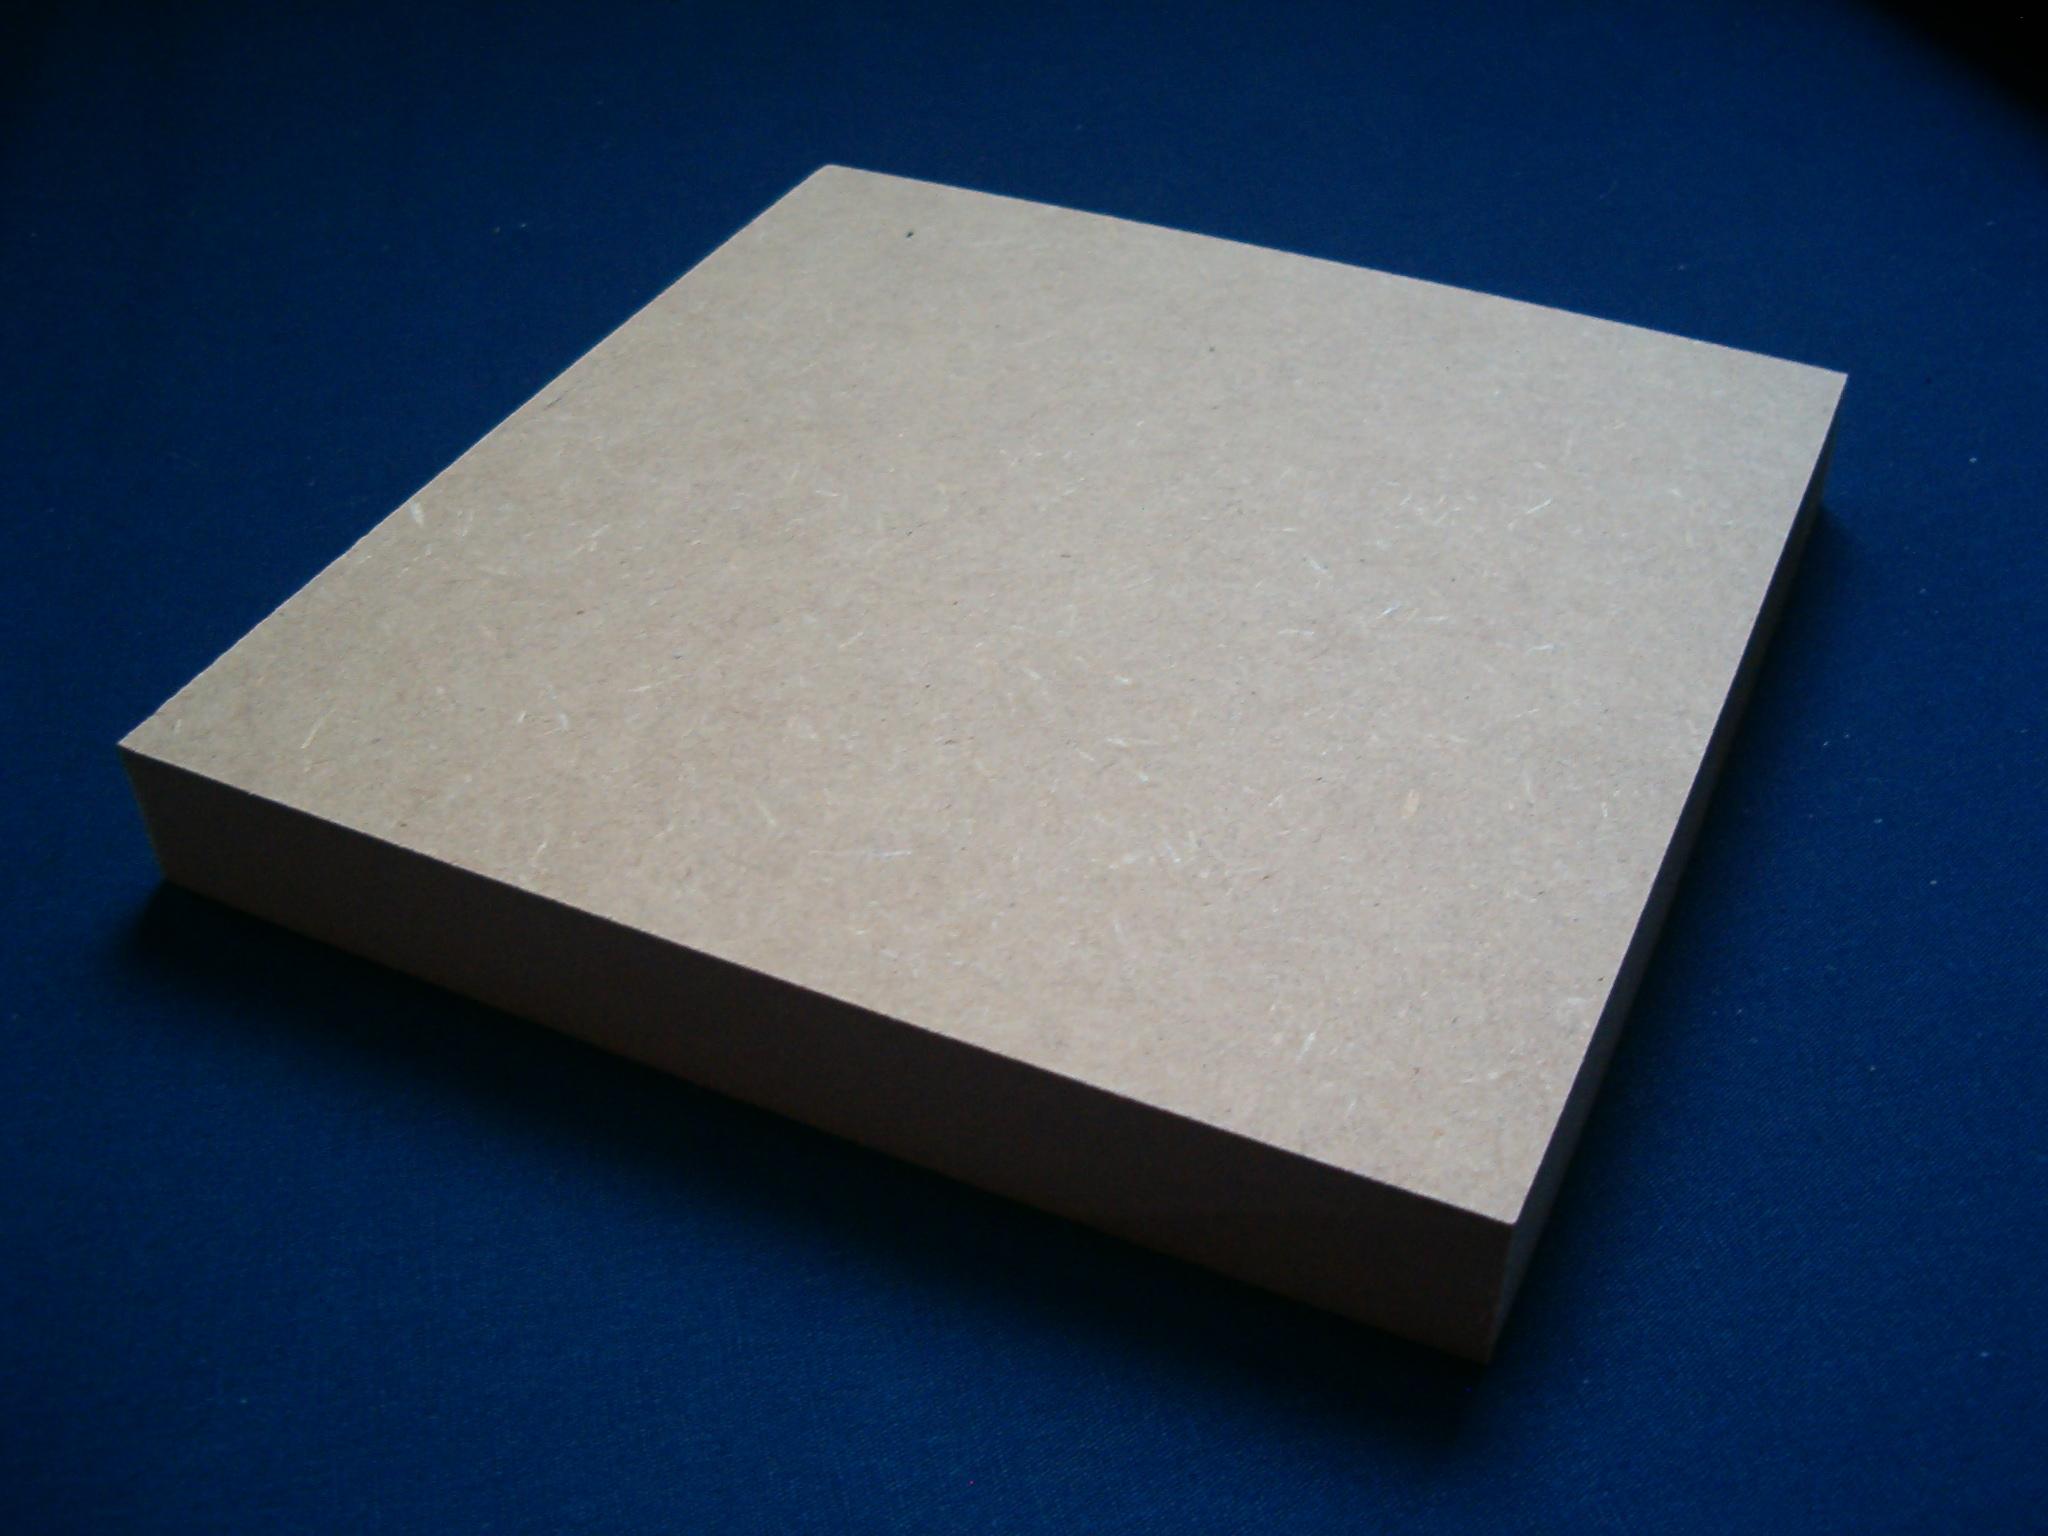 Medium density fibreboard wikiwand